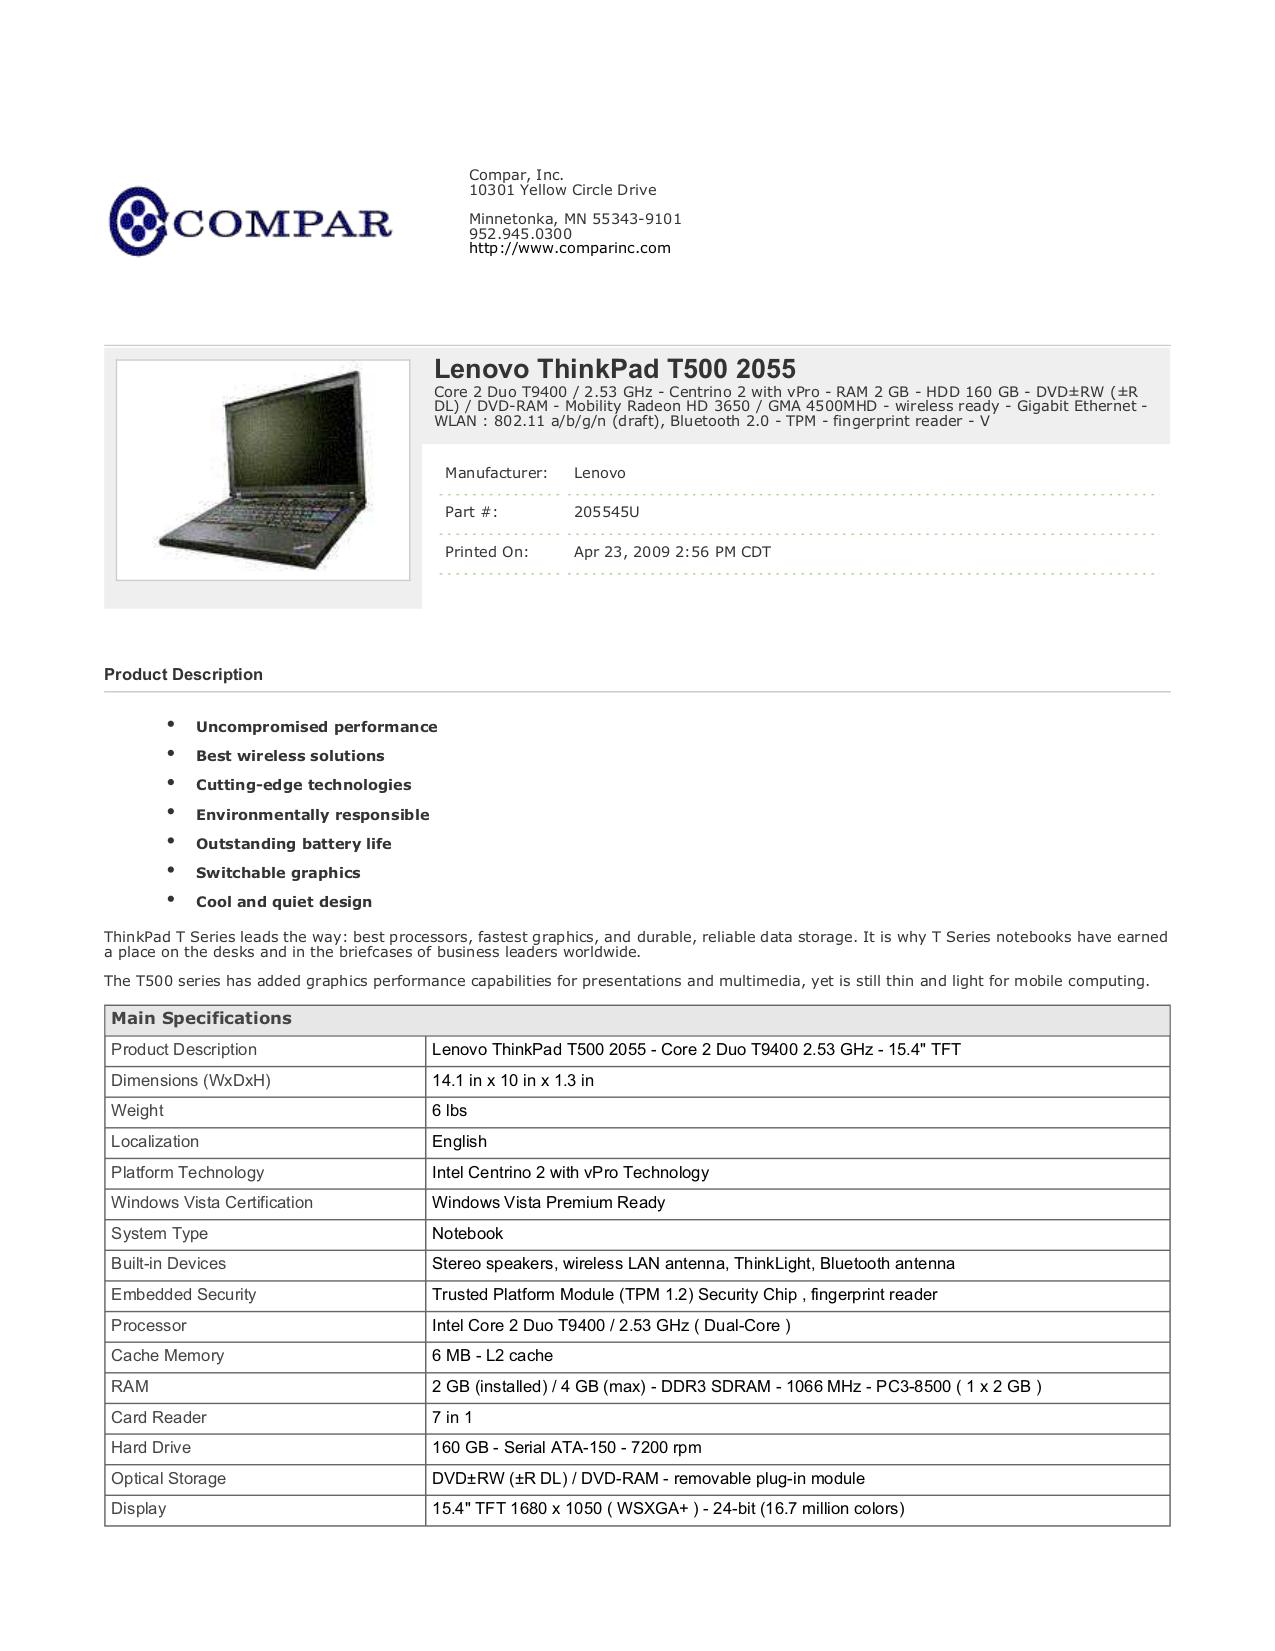 Lenovo Thinkpad t400 User manual Pdf